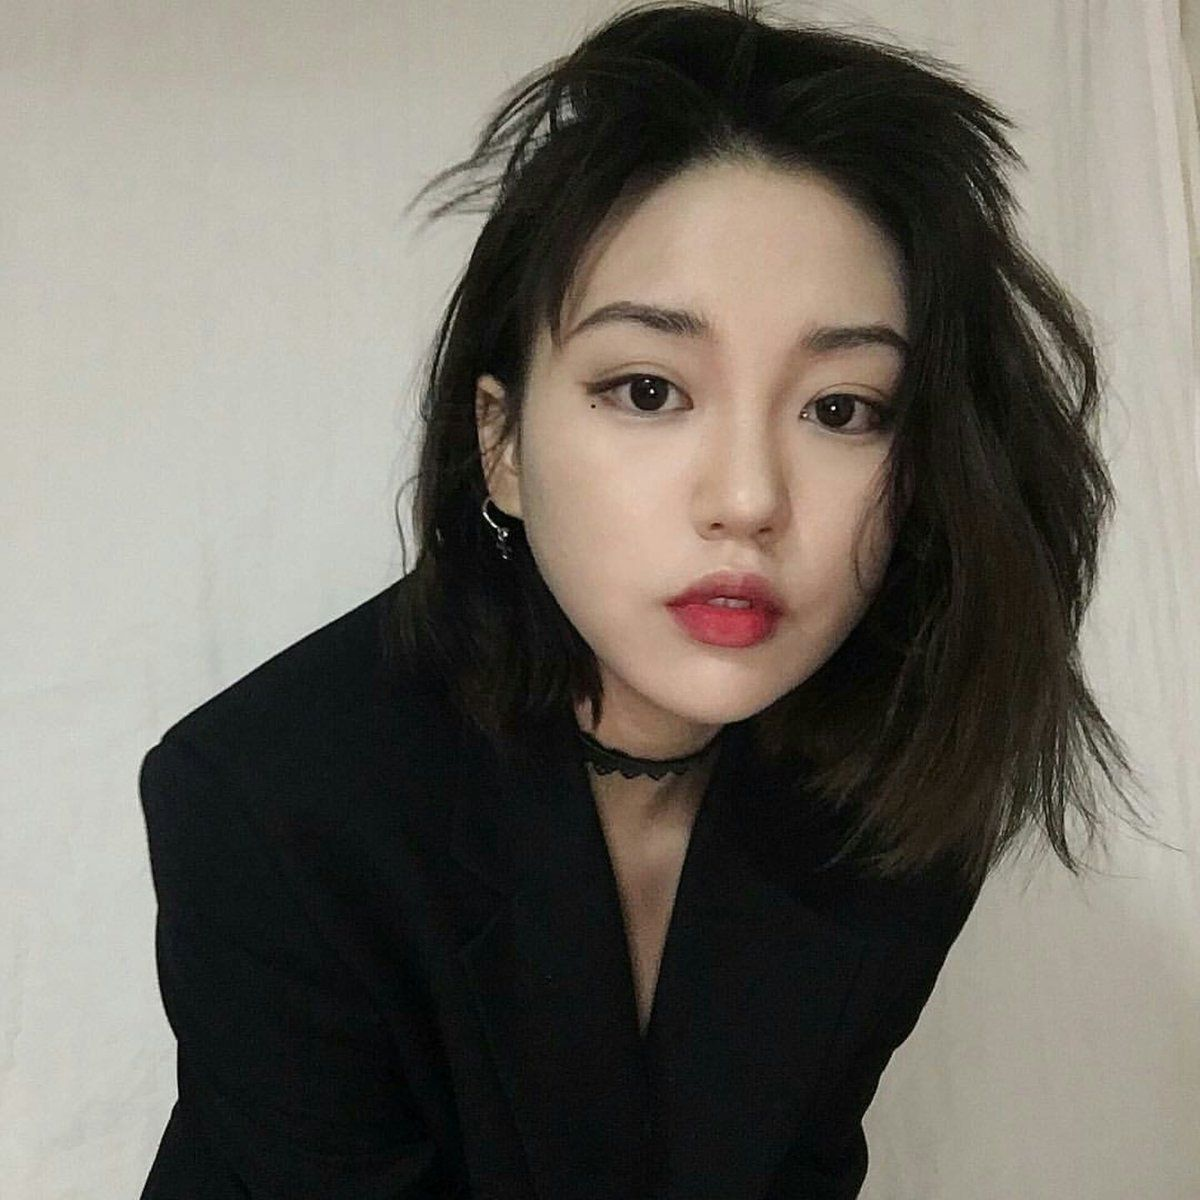 Ulzzang Girl, Short Textured